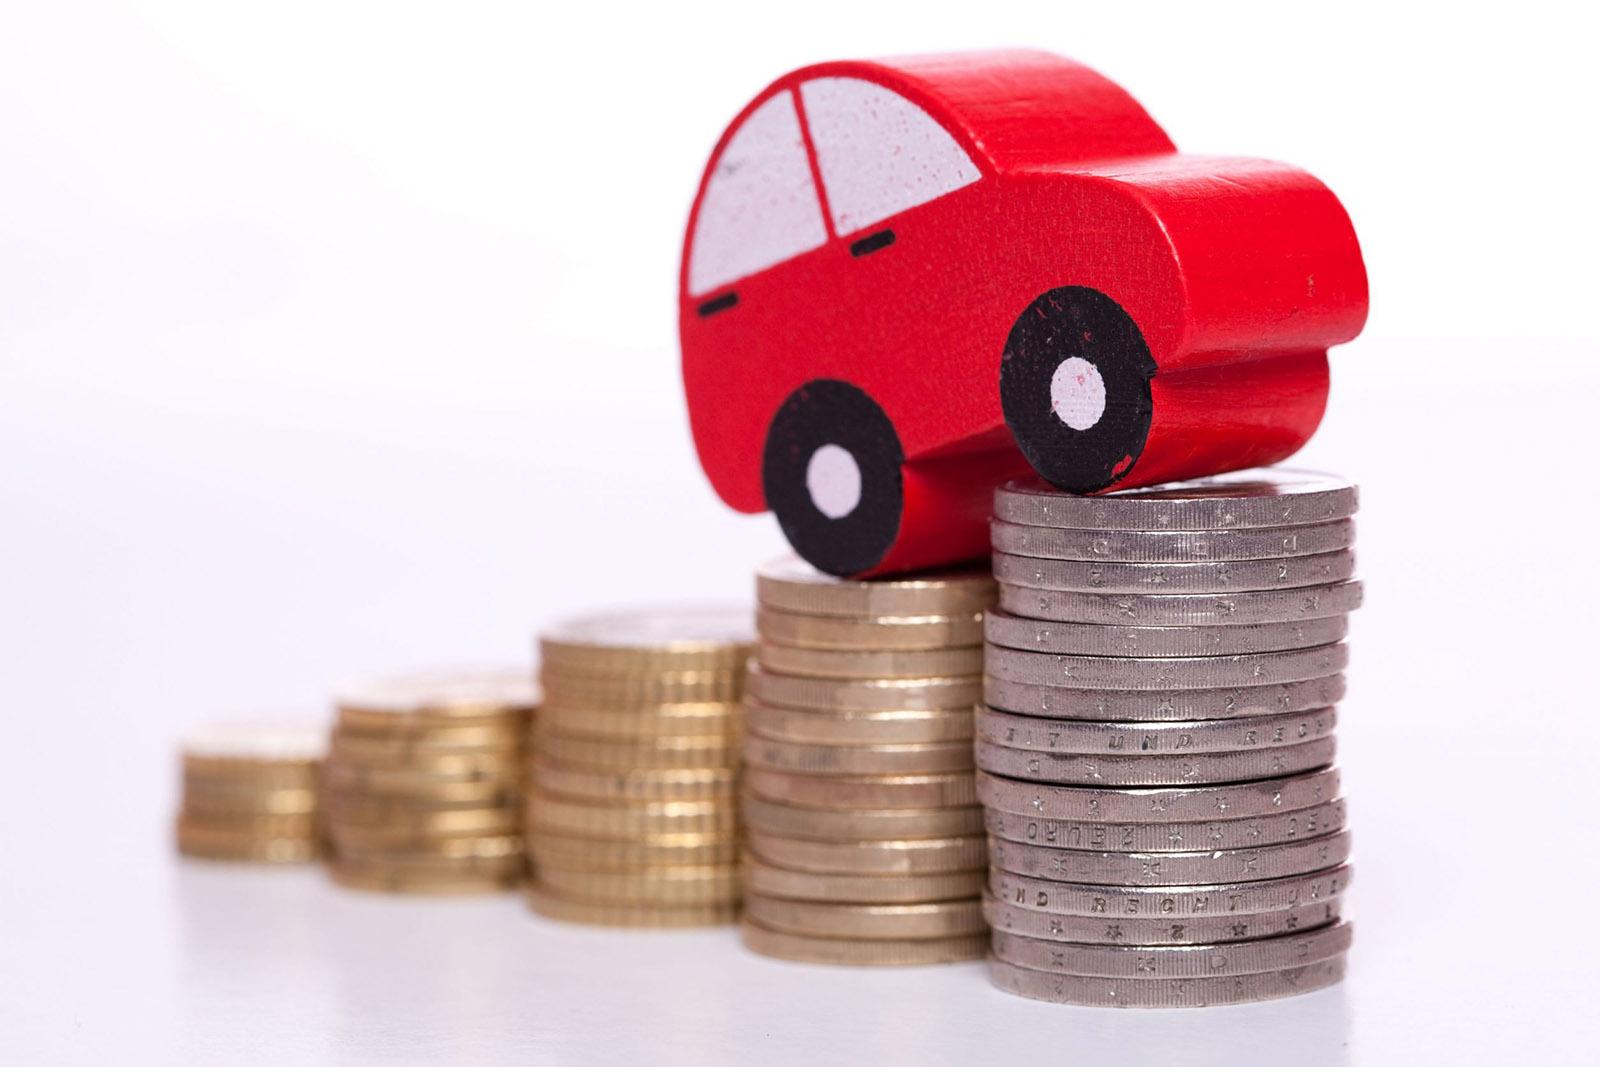 vente voiture 5 conseils pour une vente r ussie nitifilter. Black Bedroom Furniture Sets. Home Design Ideas